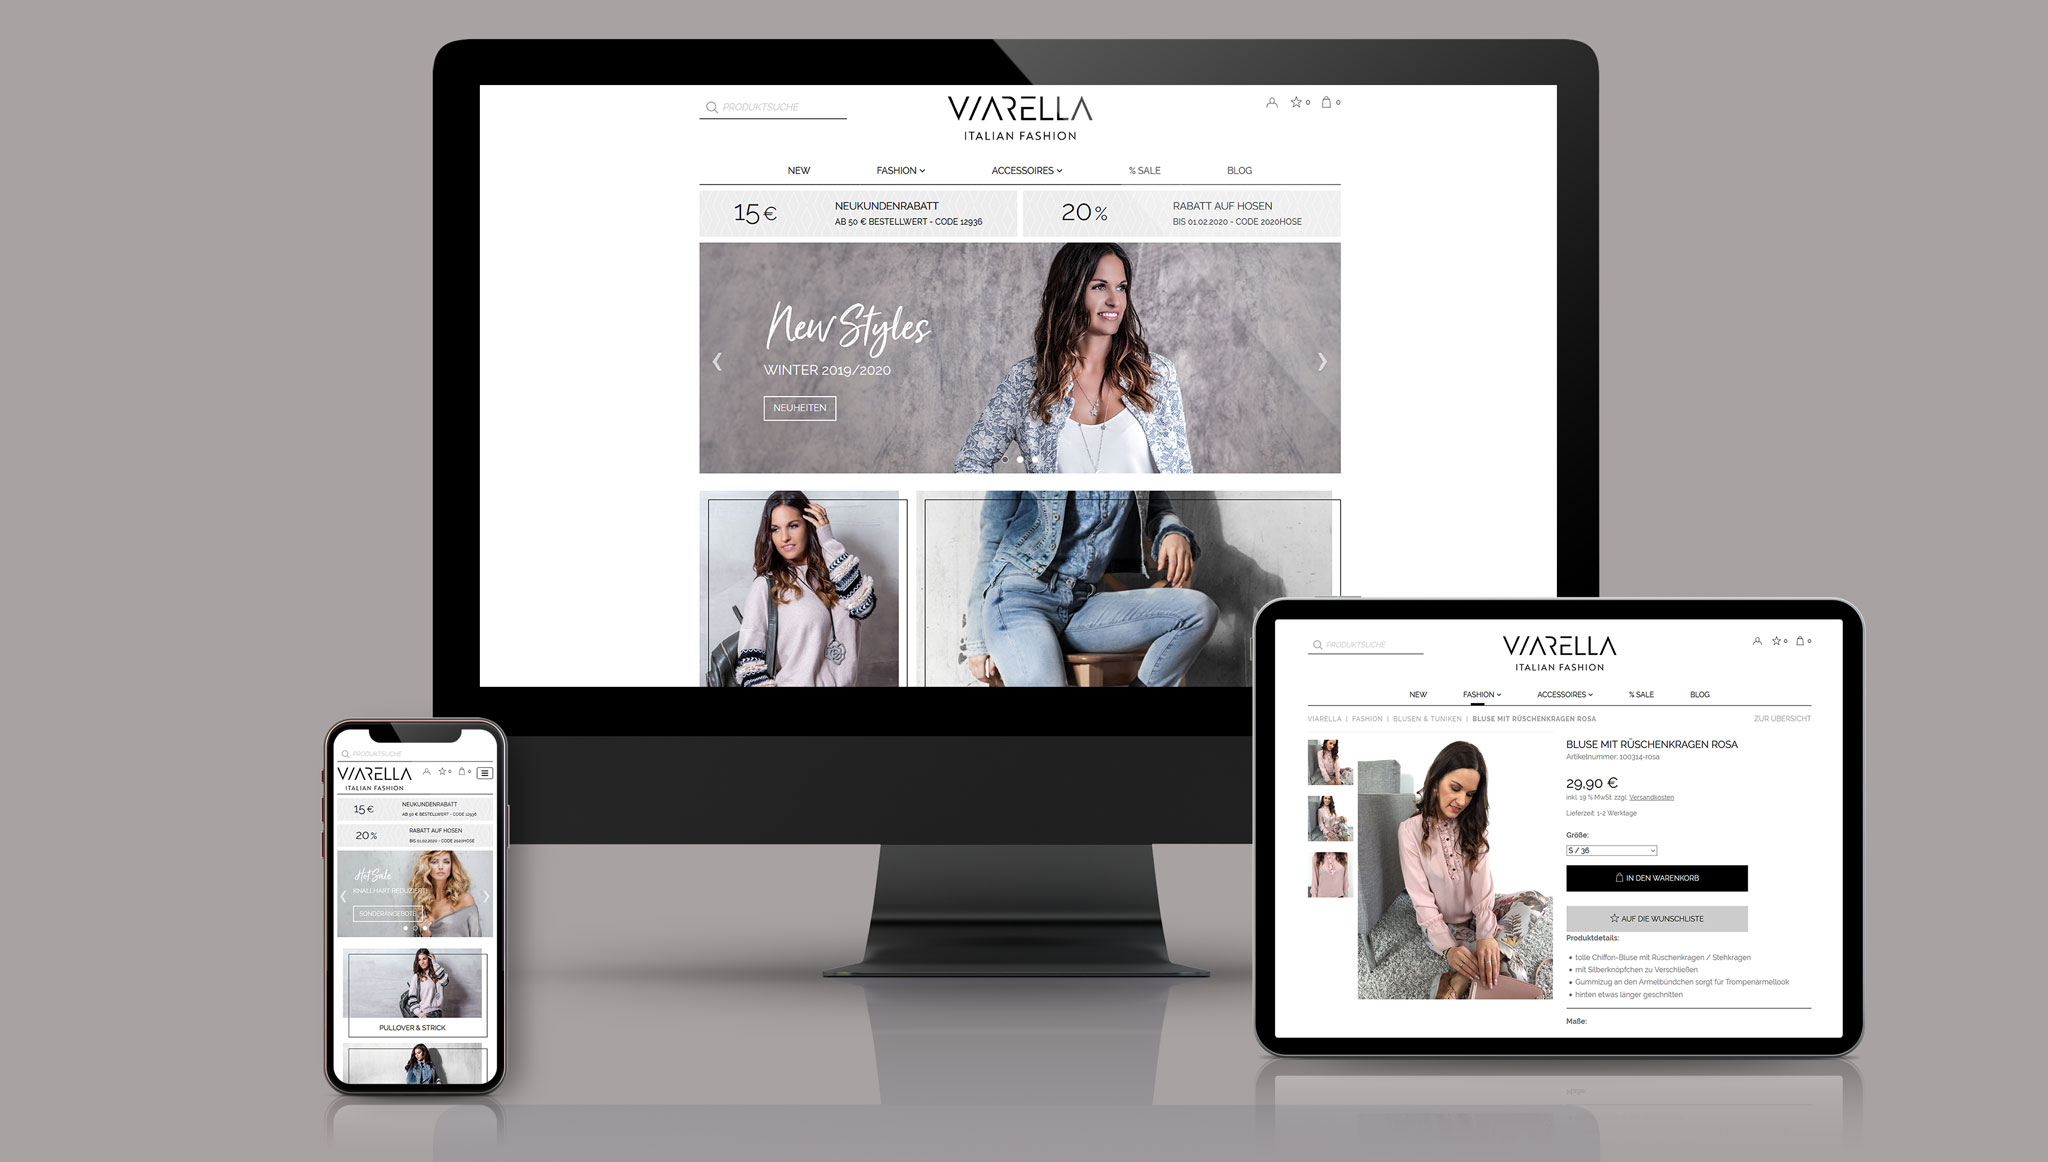 Viarella Website | Werbeagentur Roland C. Ritter